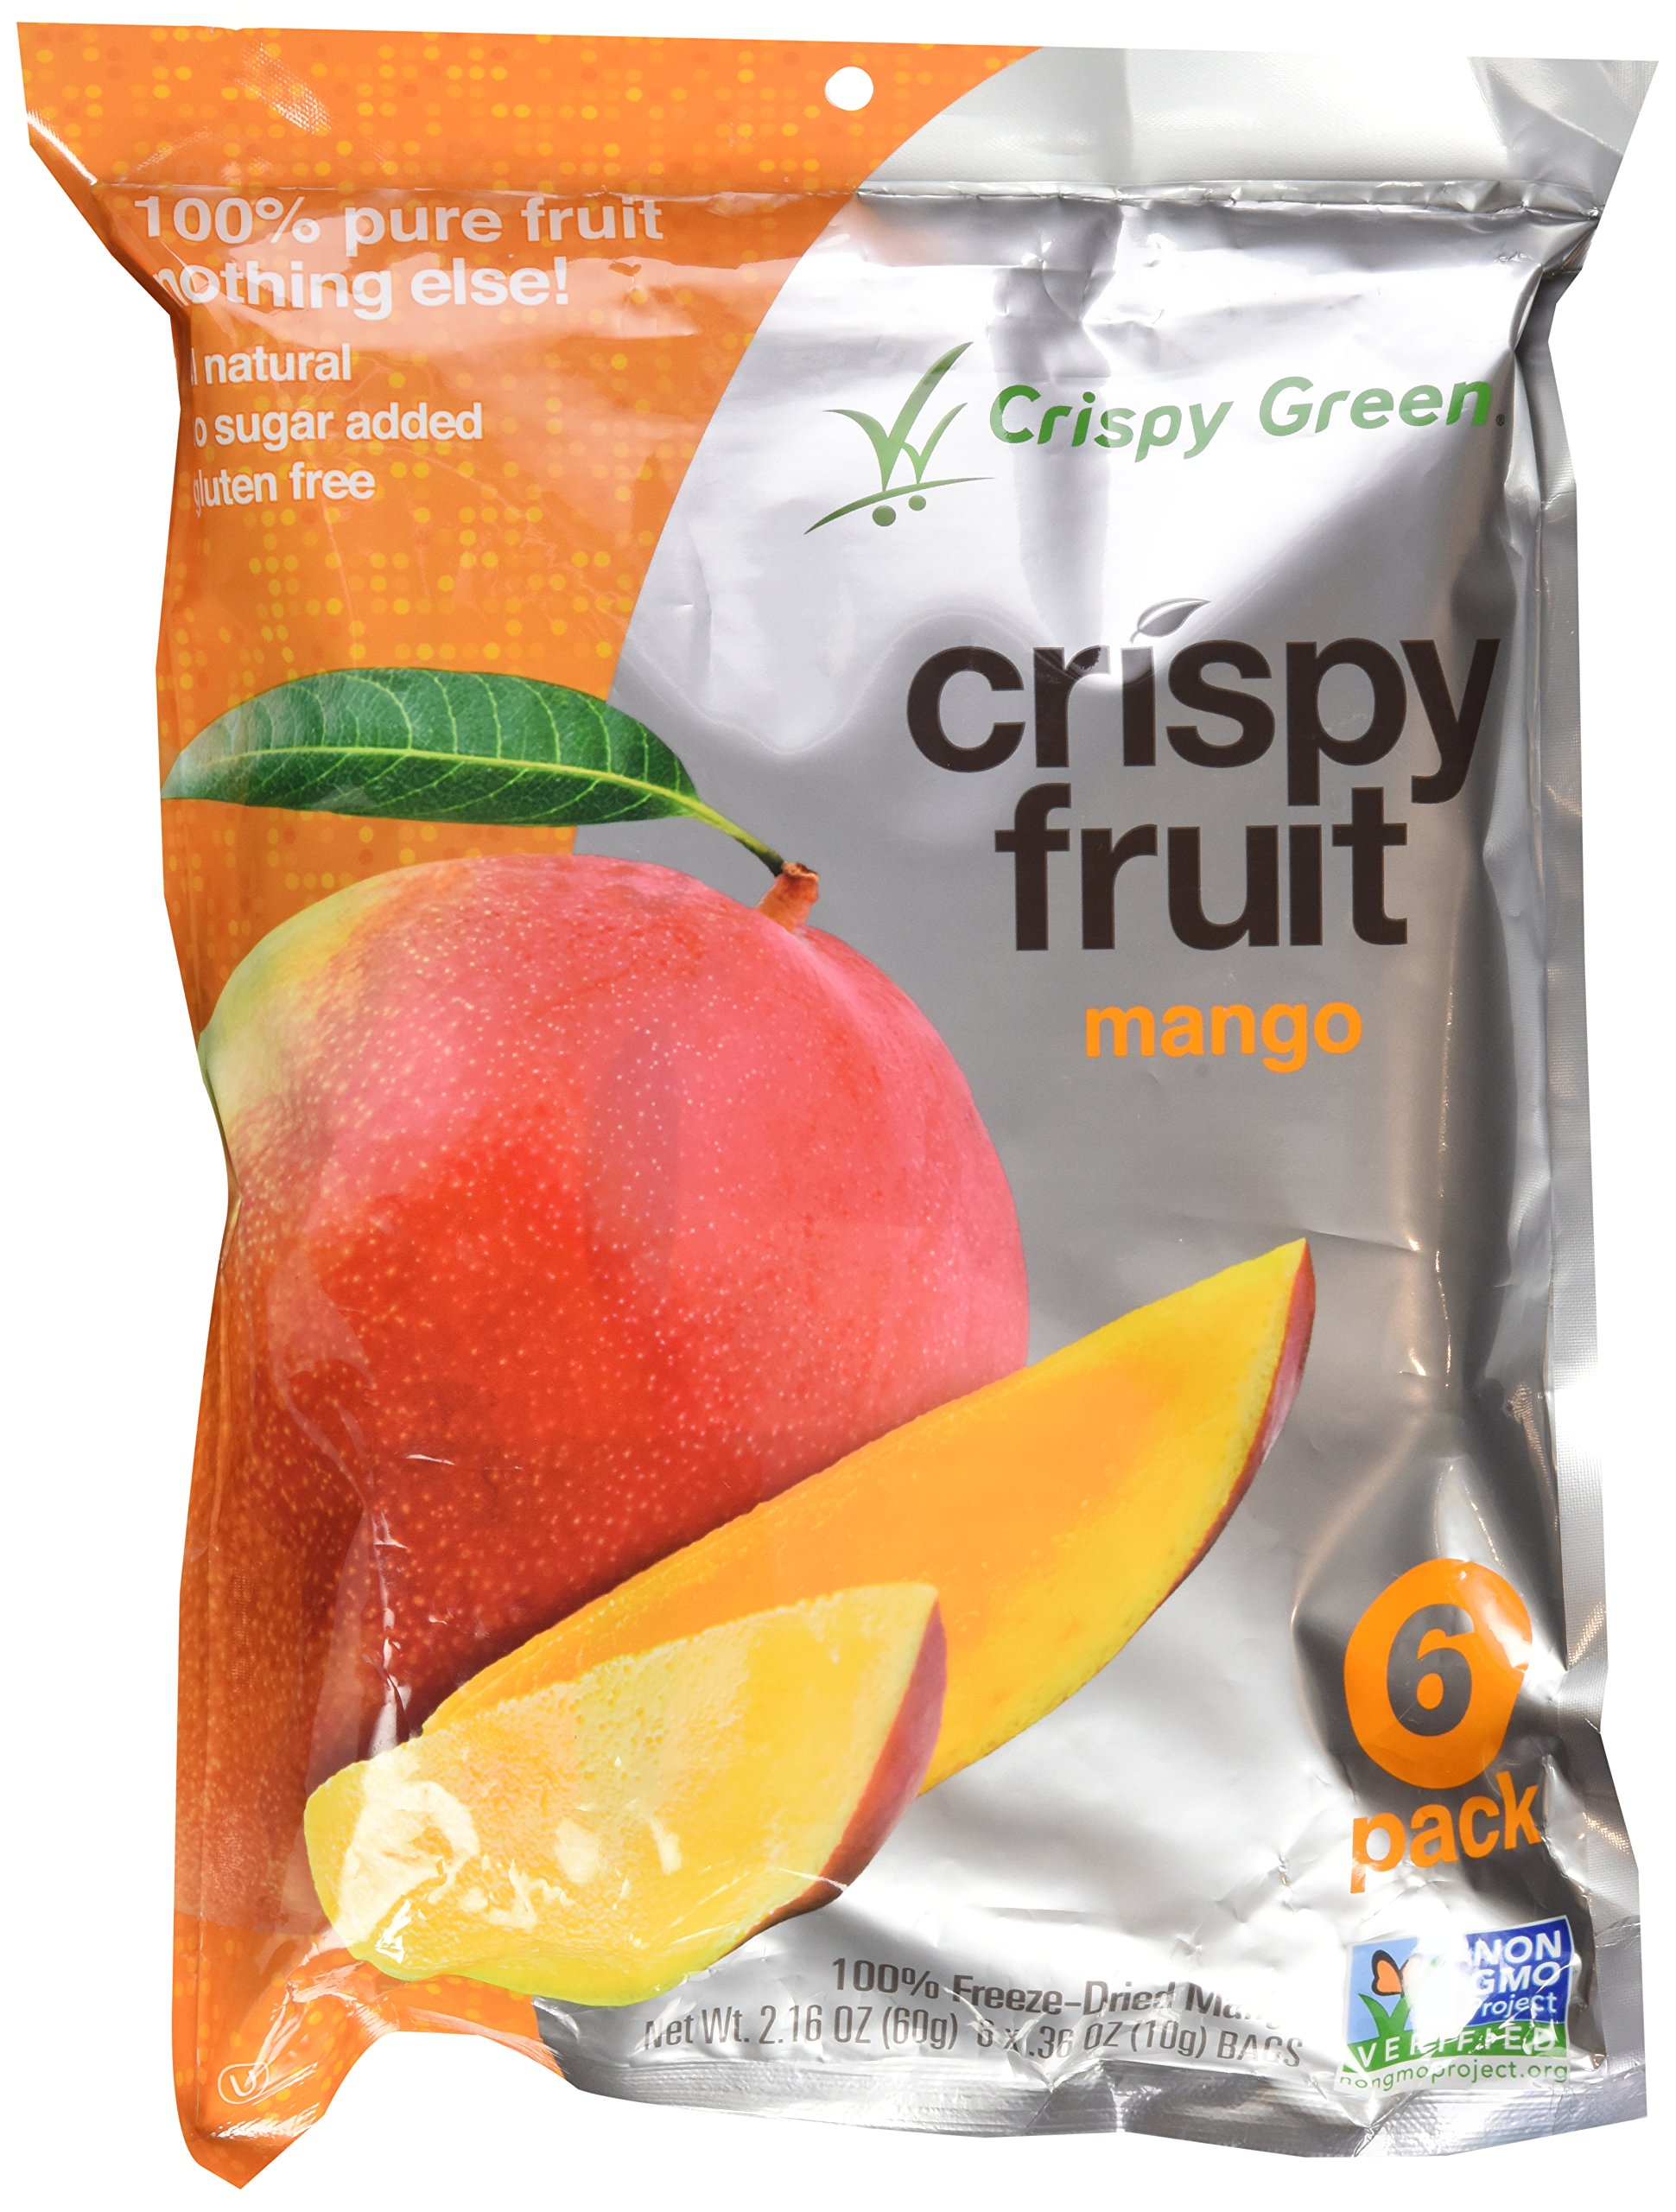 Crispy Green Dried Crispy Mango Fruit, 0.36 Ounce (Pack of 12)